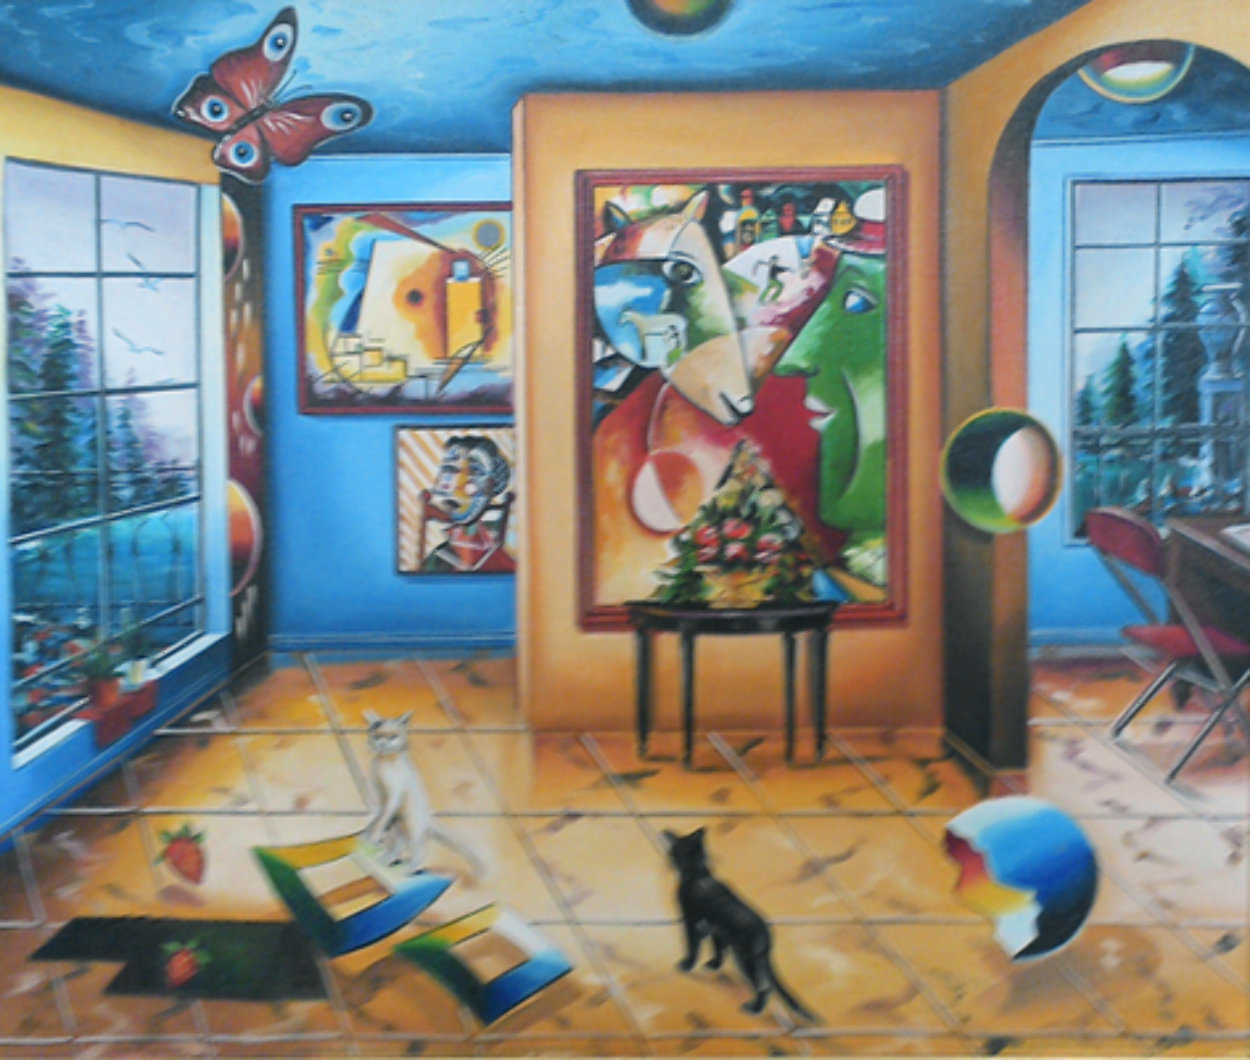 Untitled Painting 29x33 Original Painting by Alexander Astahov